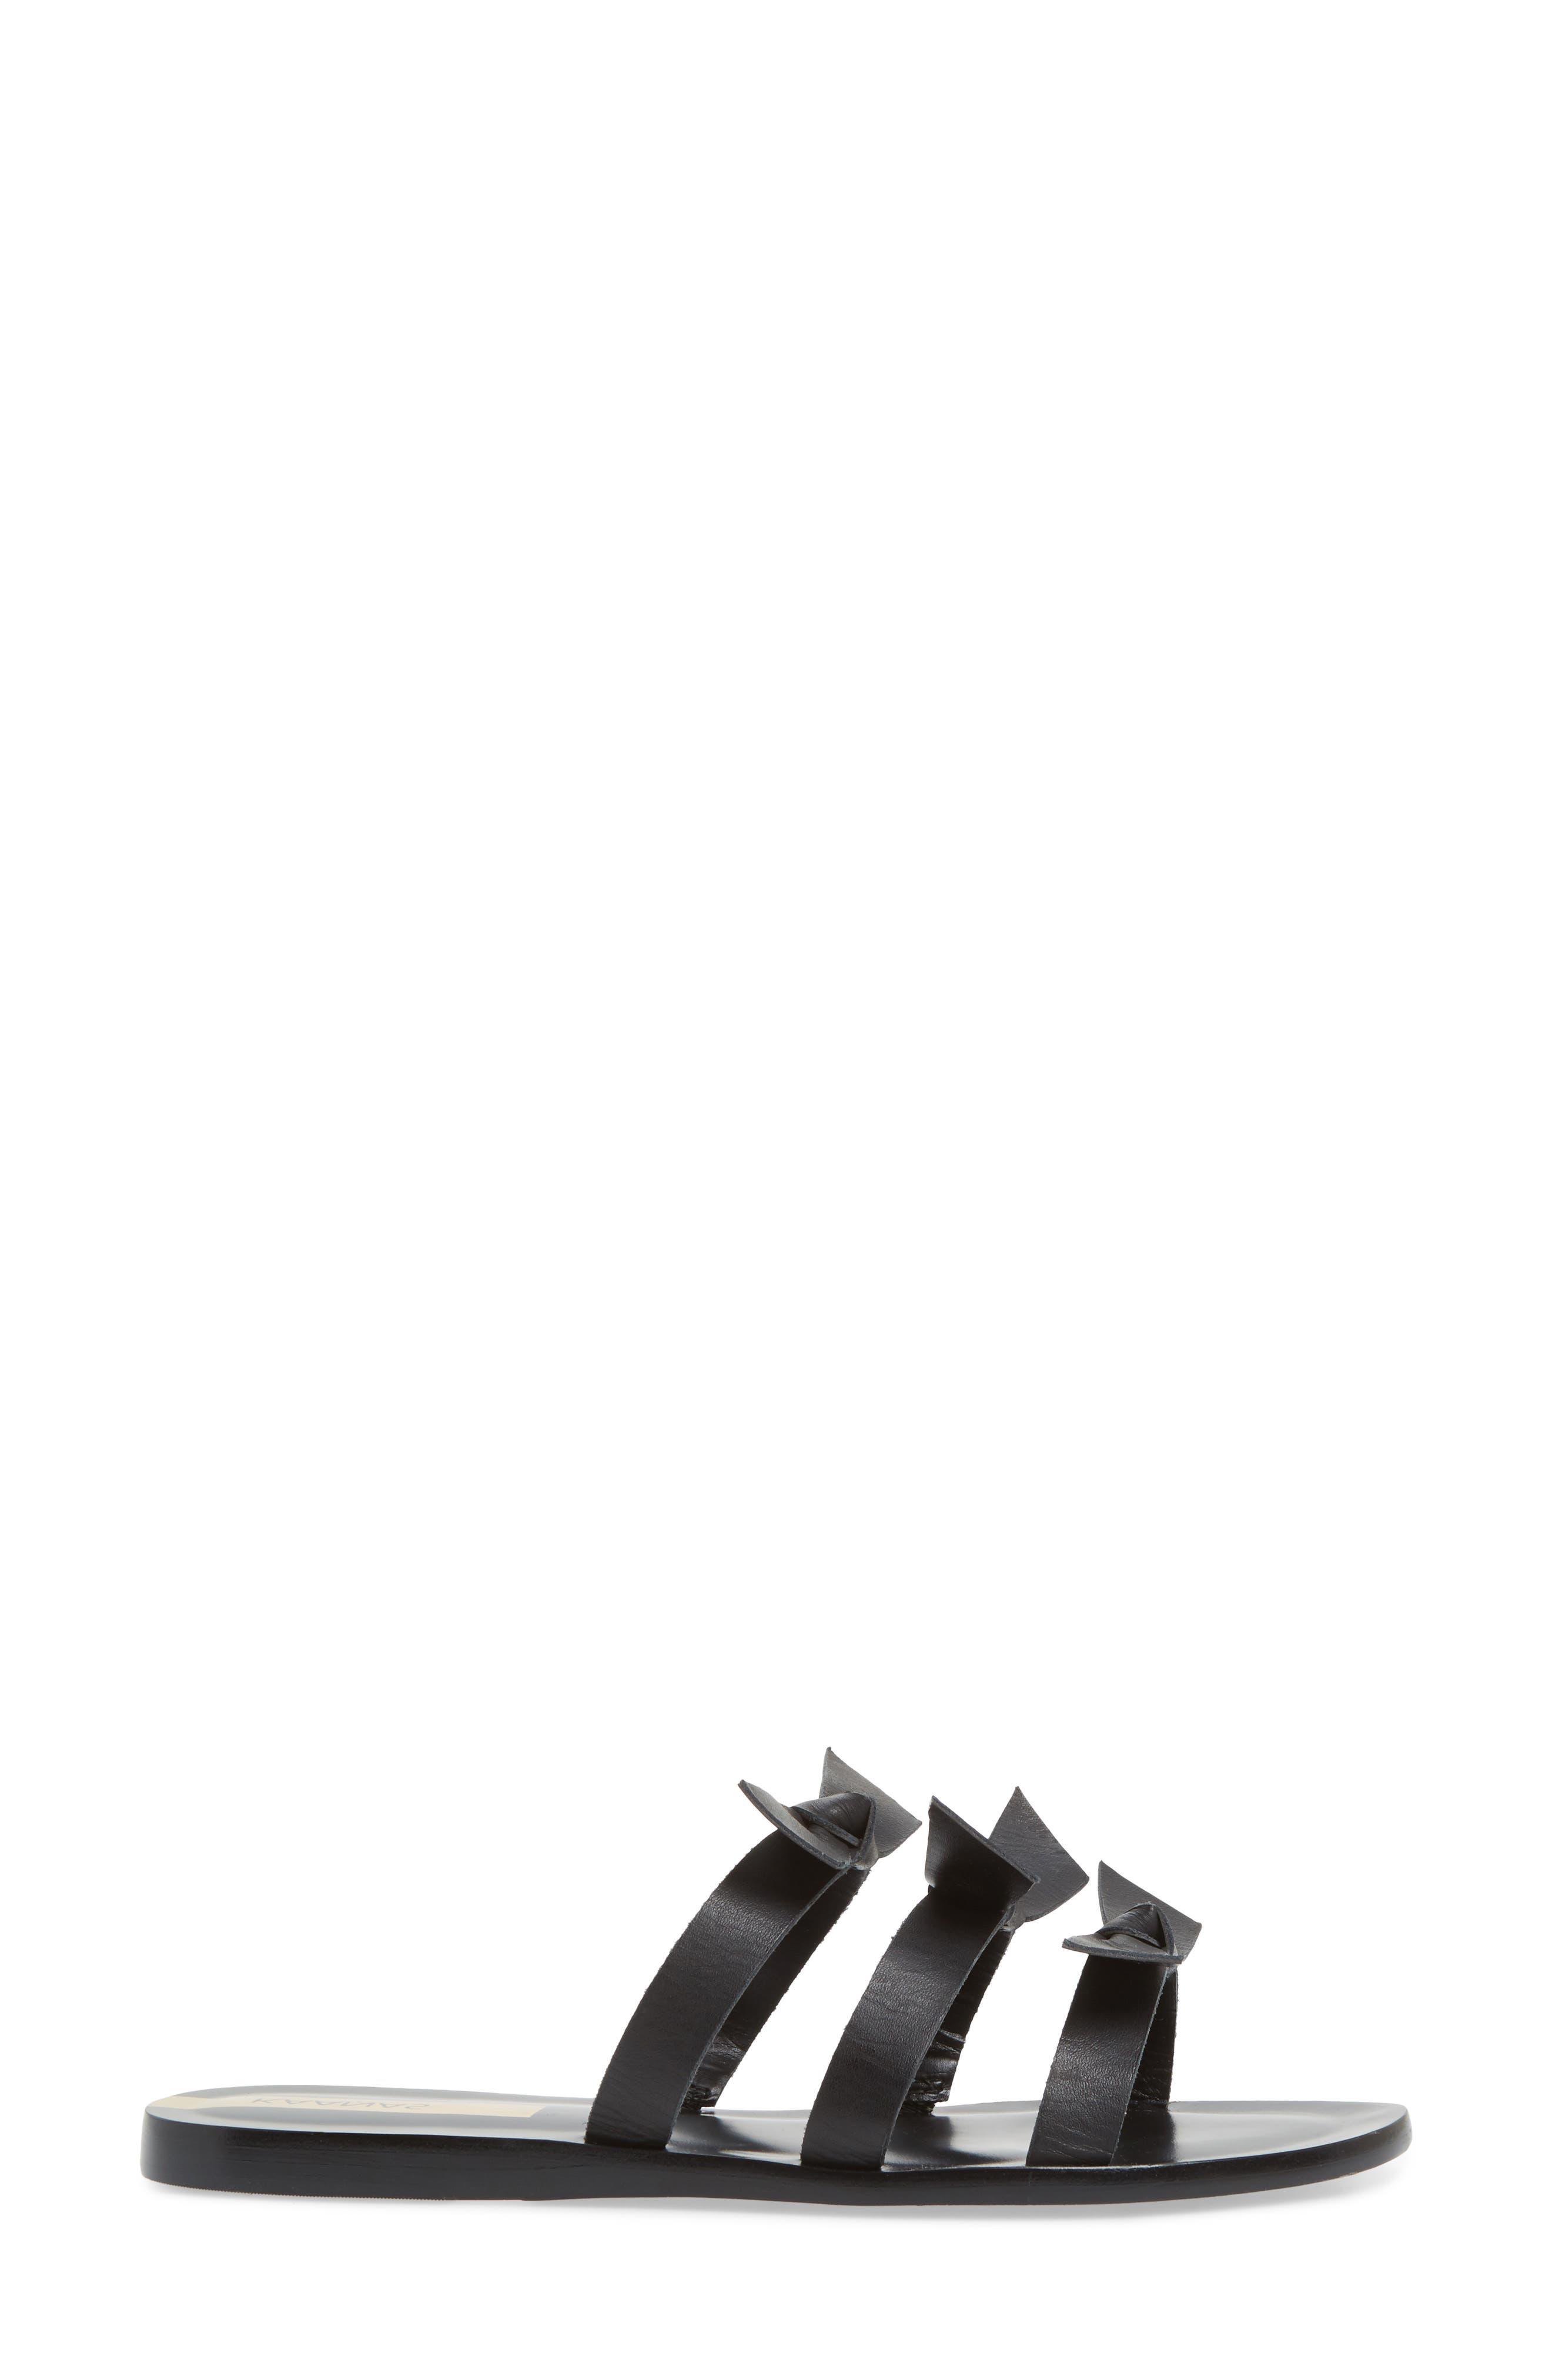 Recife Knotted Slide Sandal,                             Alternate thumbnail 3, color,                             Black